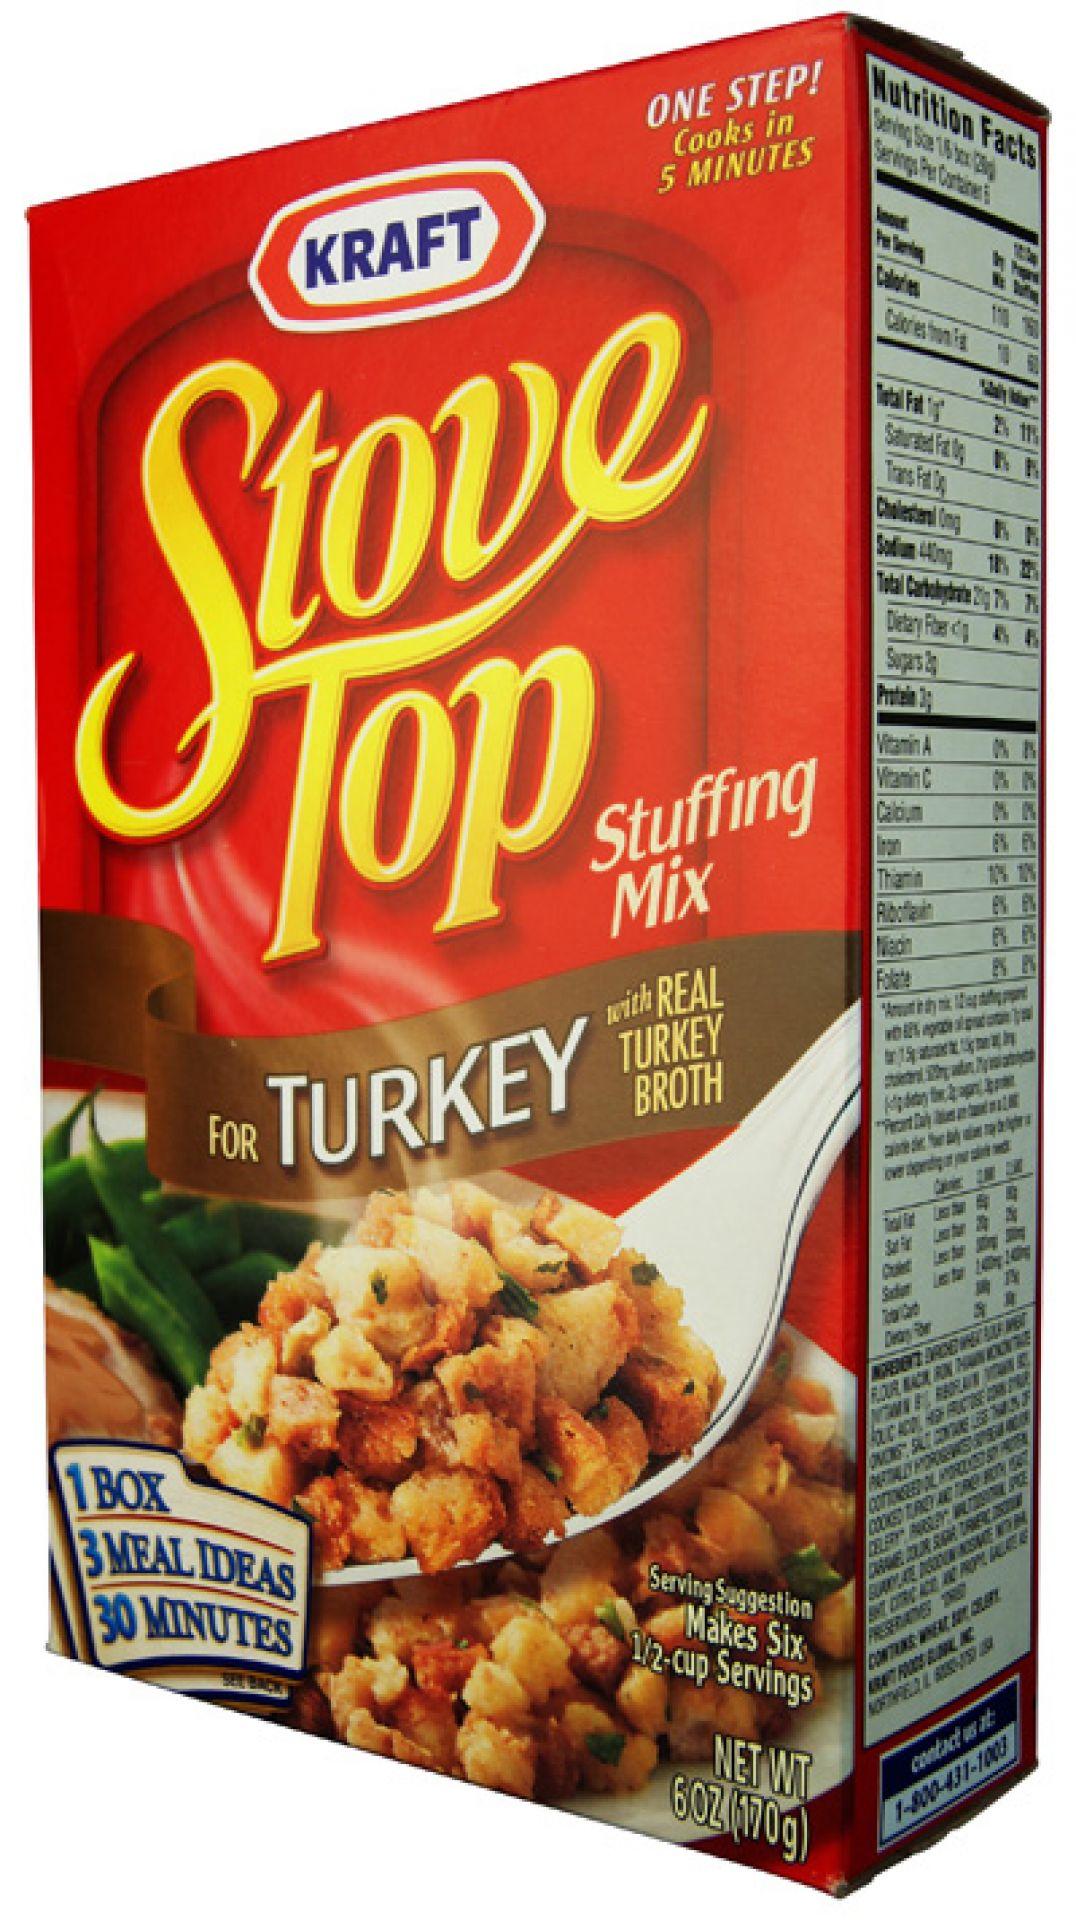 Stovetop Stuffing Turkey